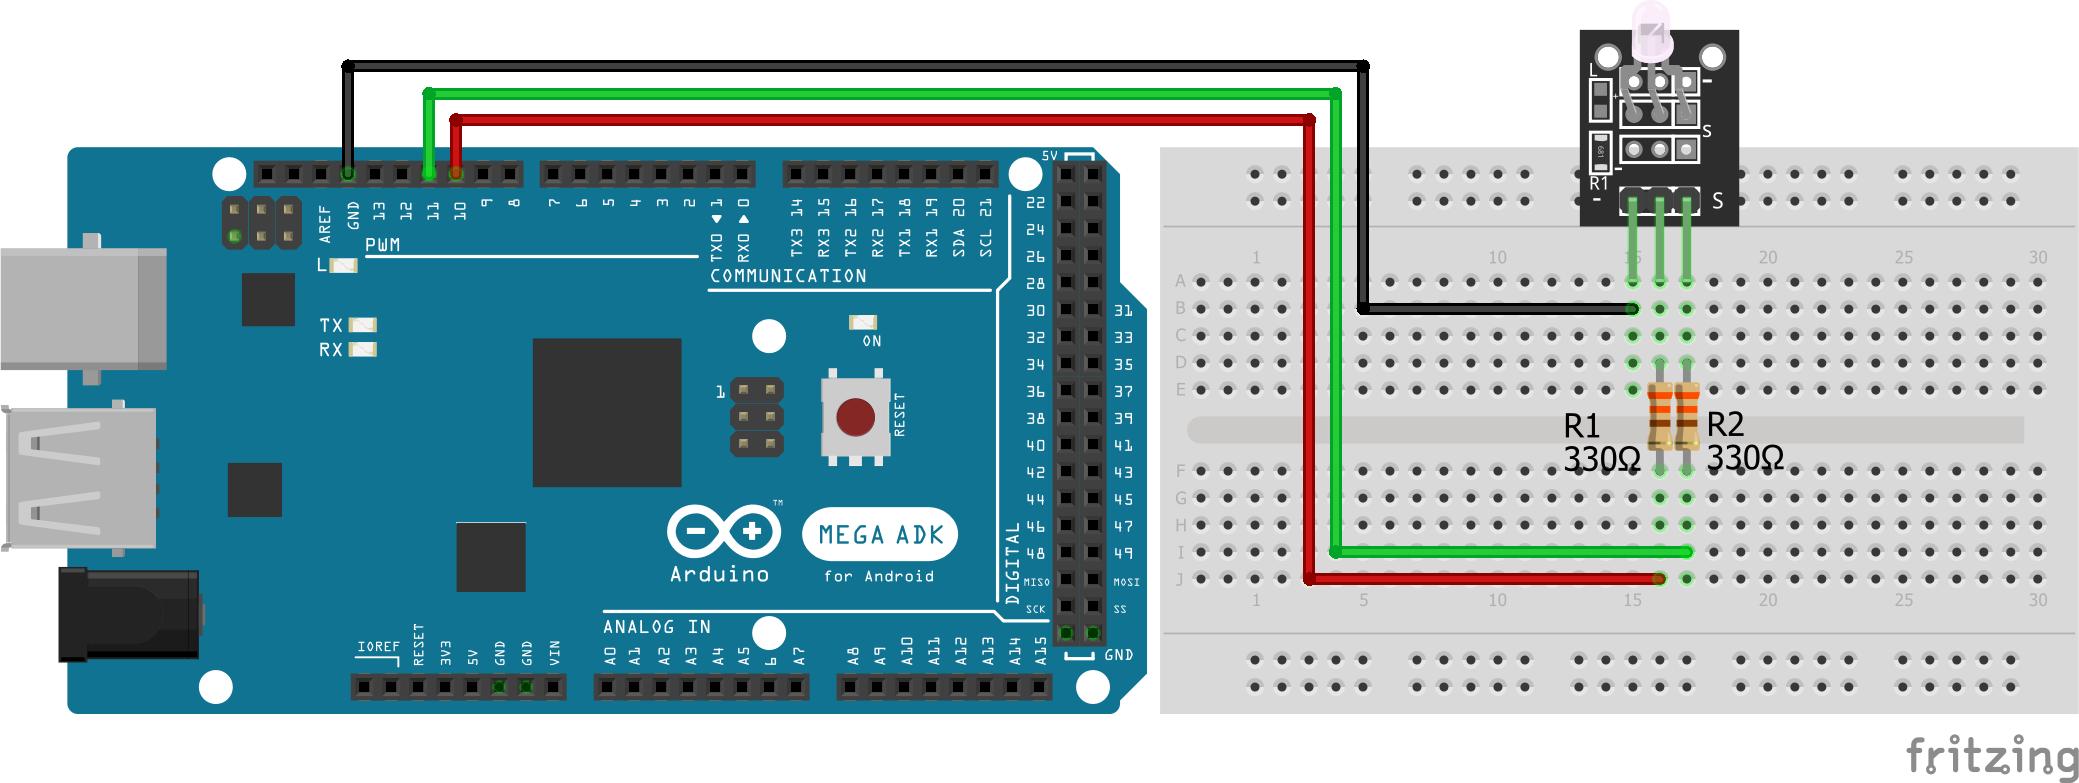 Two-color LED KY-011 Arduino Mega